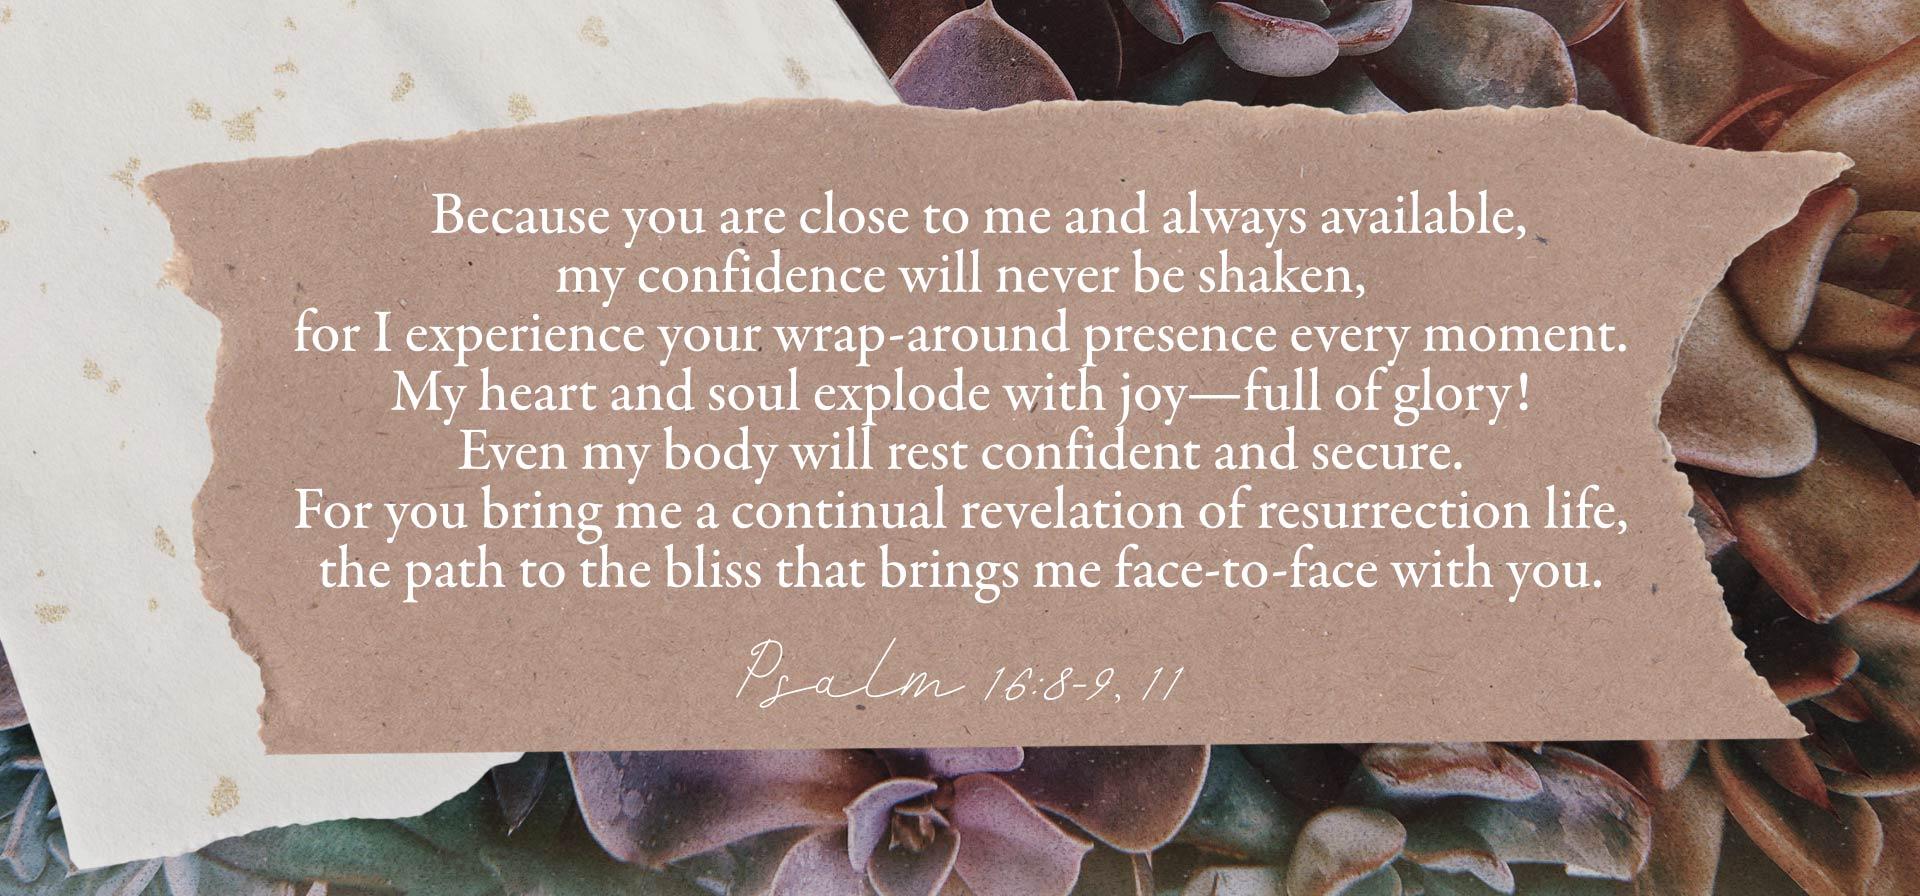 7. psalm 16 2-9 11.jpg